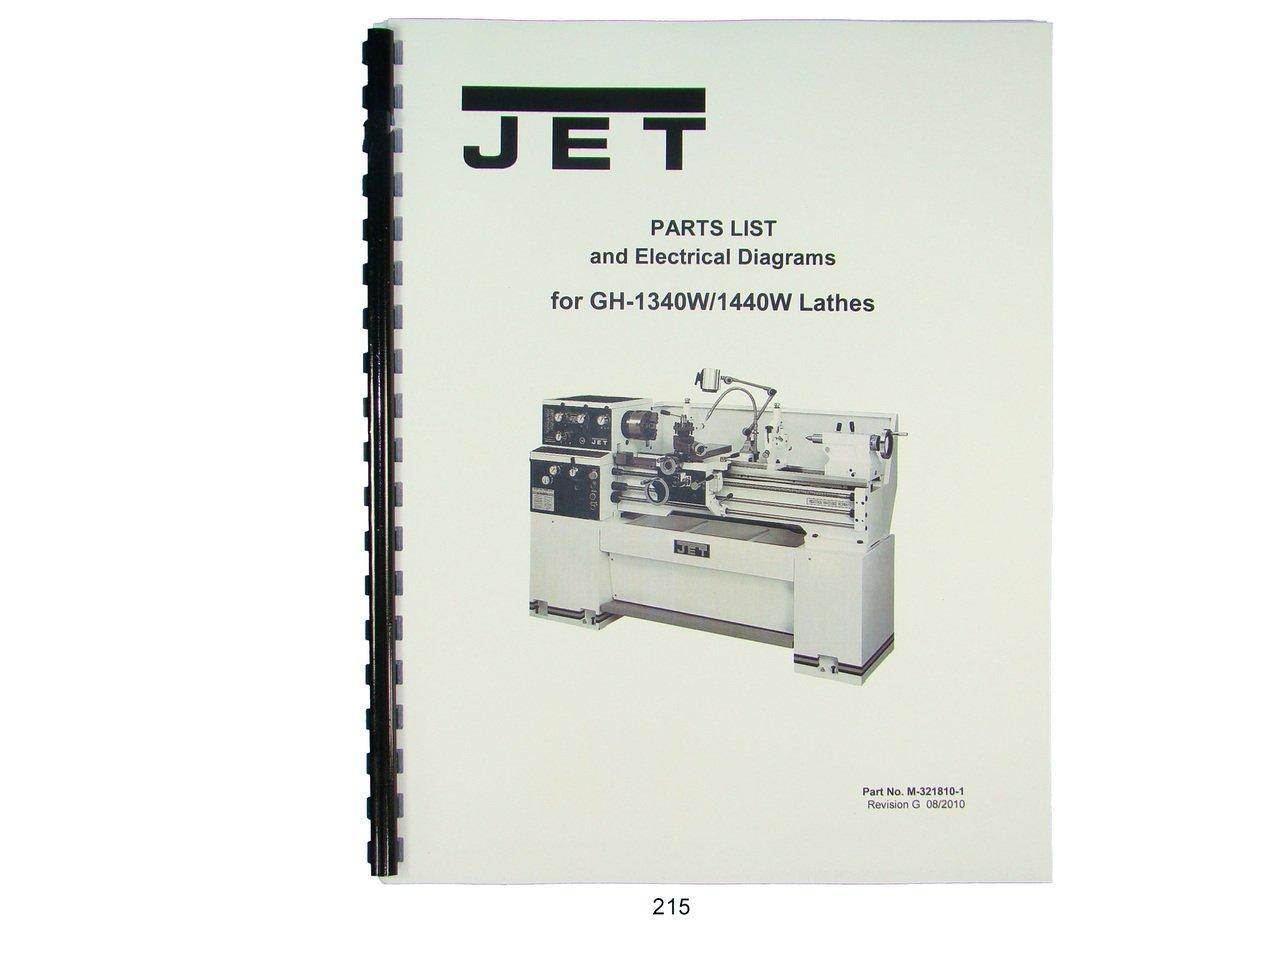 Jet GH-1340W/1440W Lathe Parts List & Electrical Diagrams Manual: Jet:  Amazon.com: Books